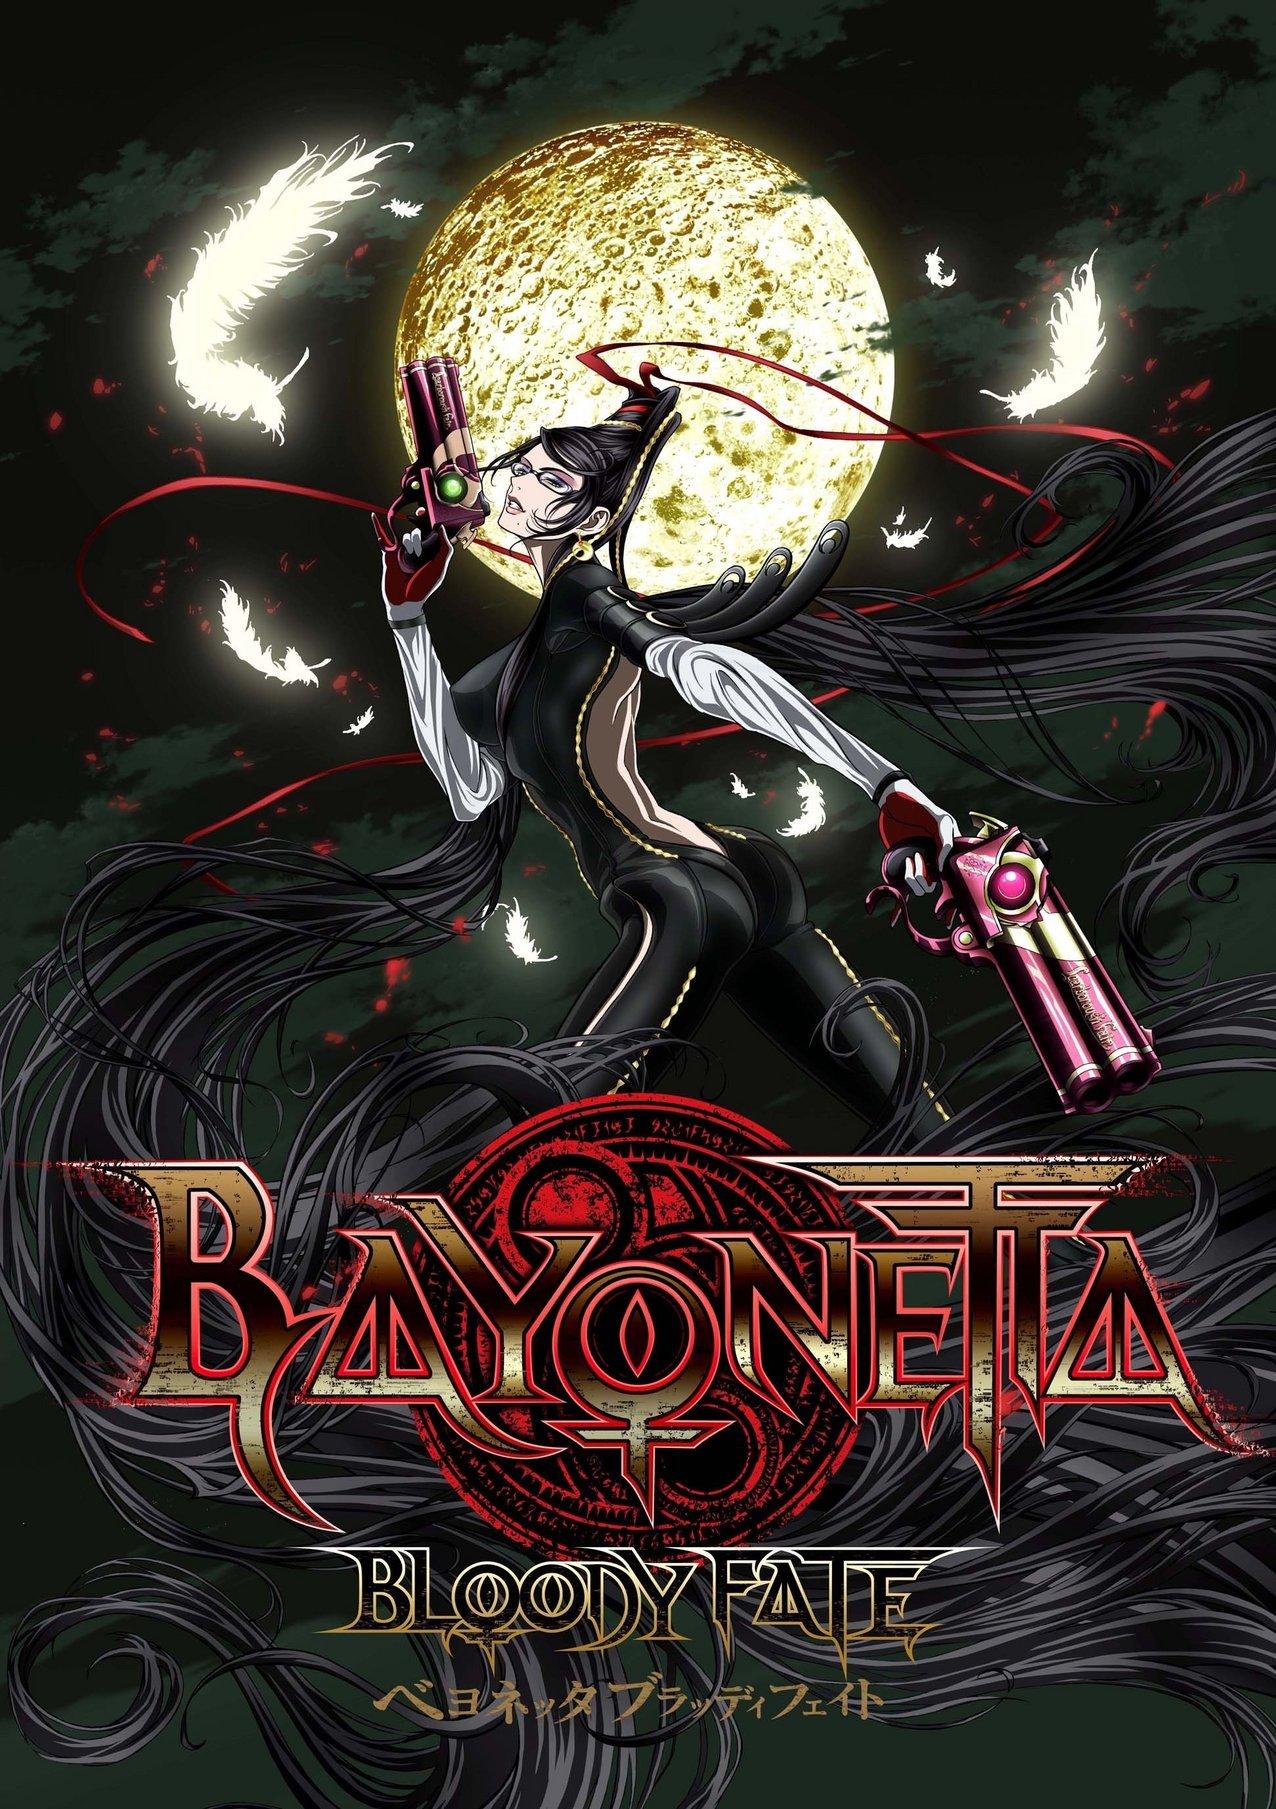 Bayonetta: Bloody Fate (DVD, 2014) 704400072802 | eBay